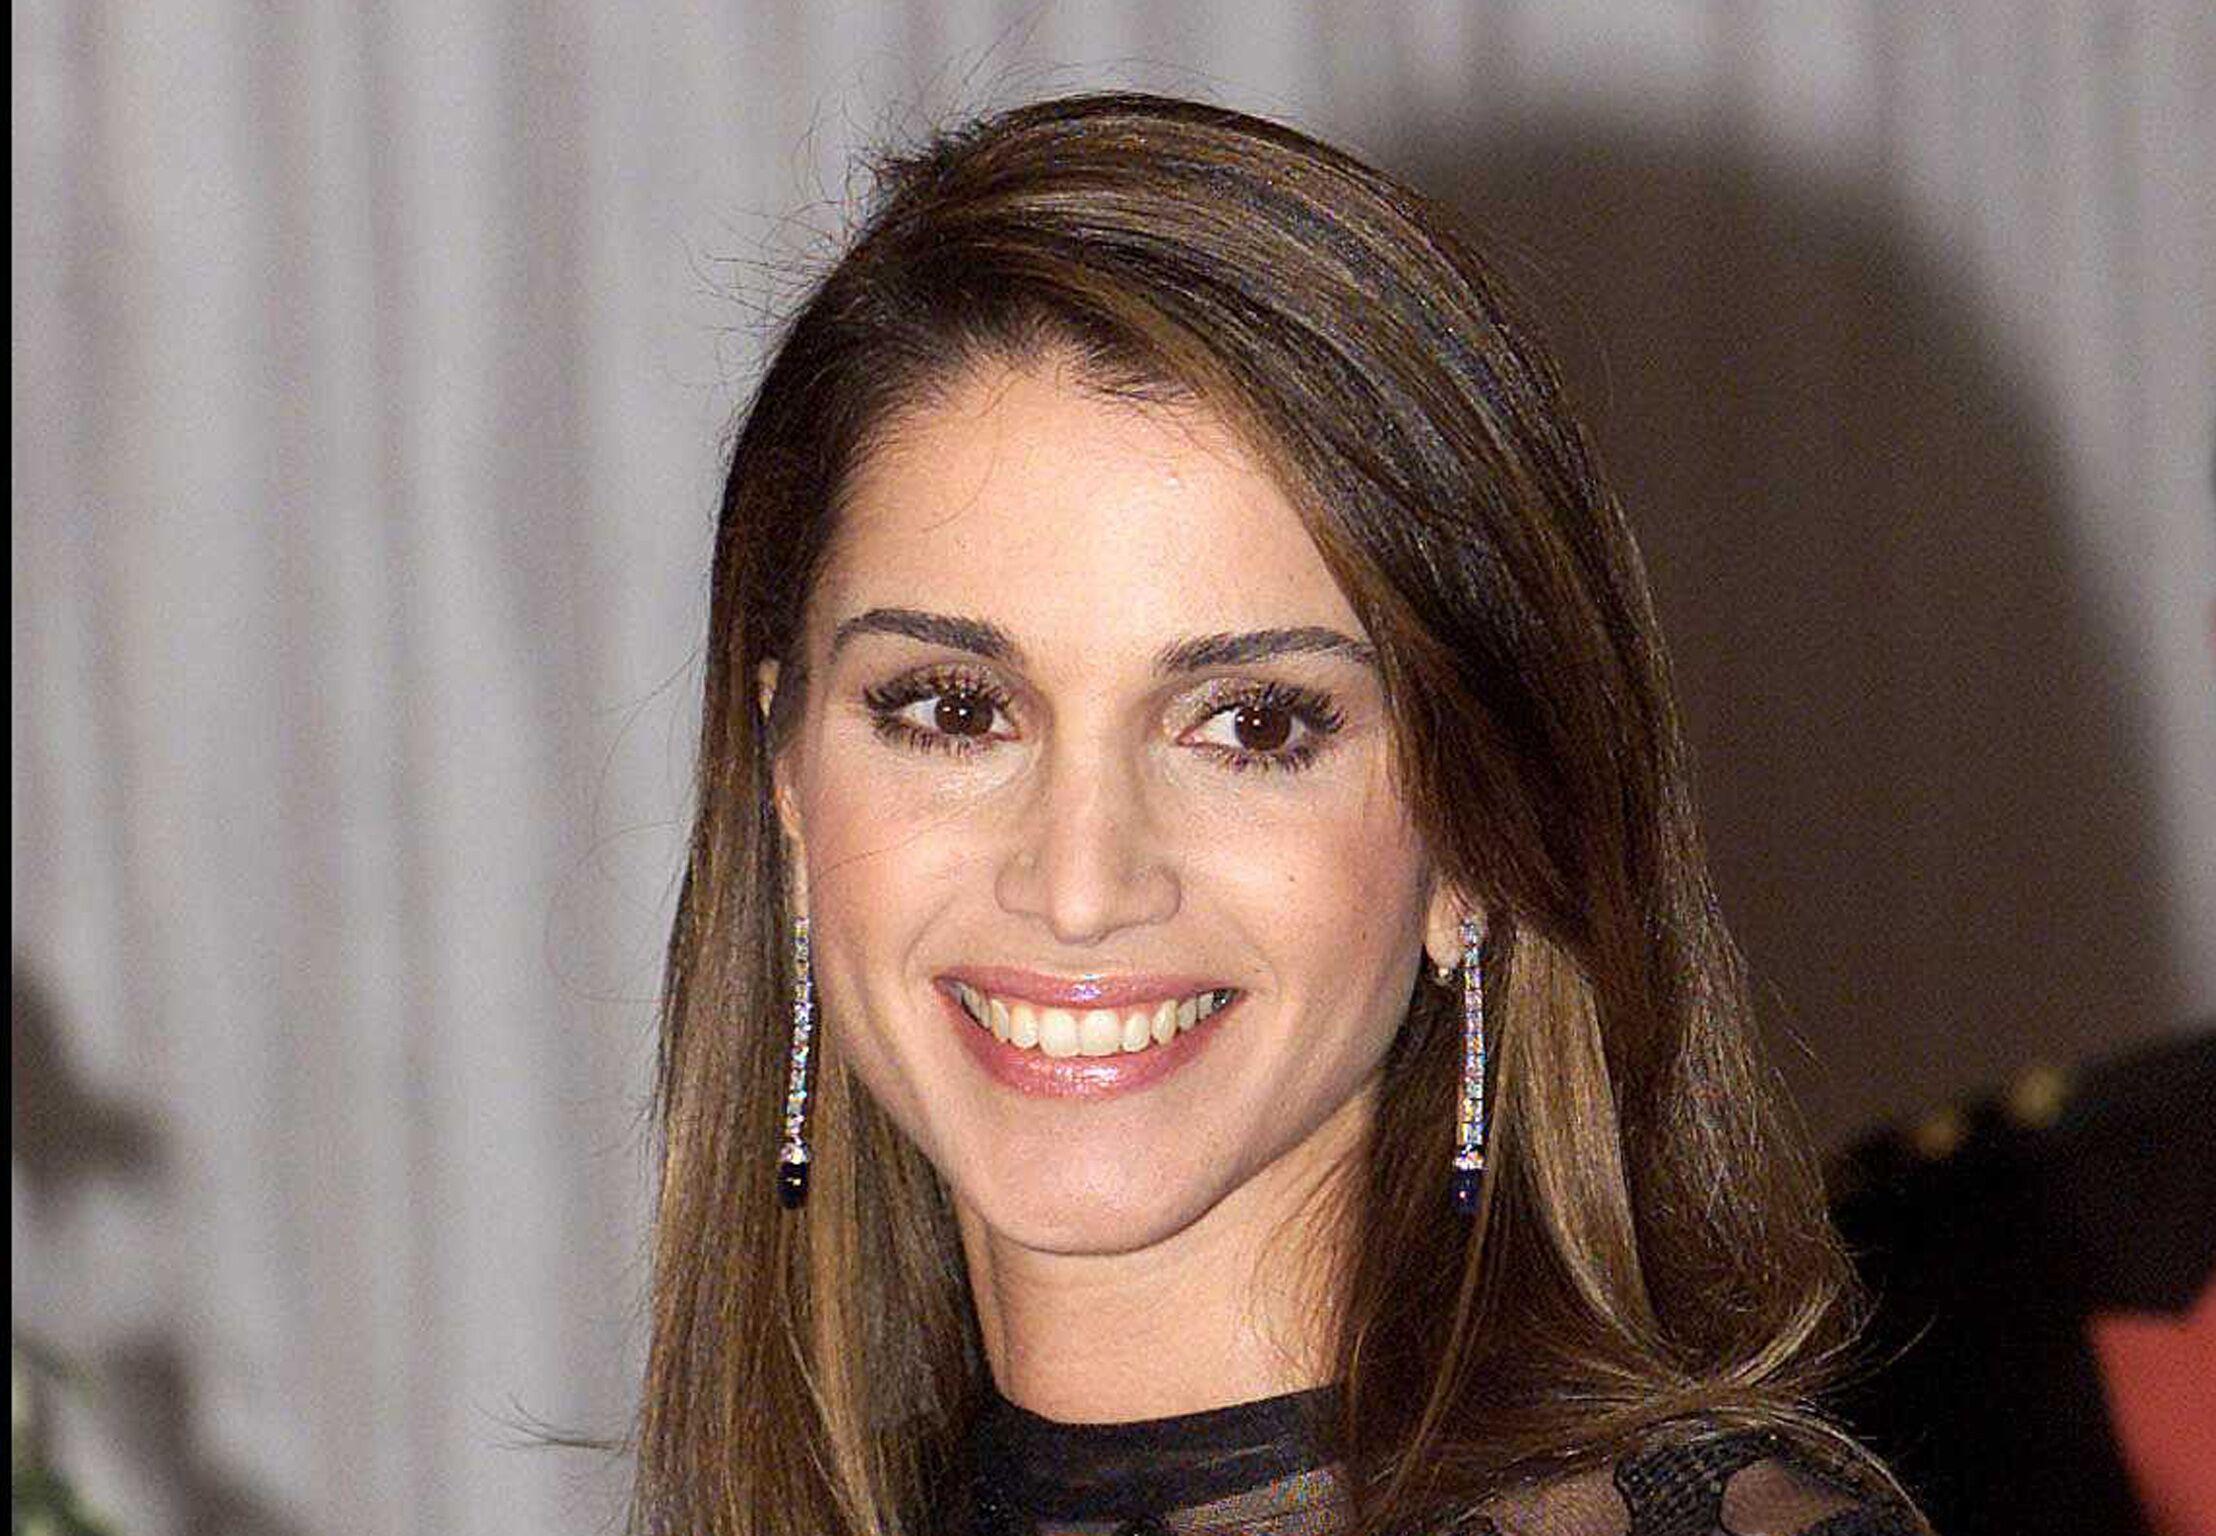 Rania De Jordanie La Biographie De Rania De Jordanie Avec Gala Fr